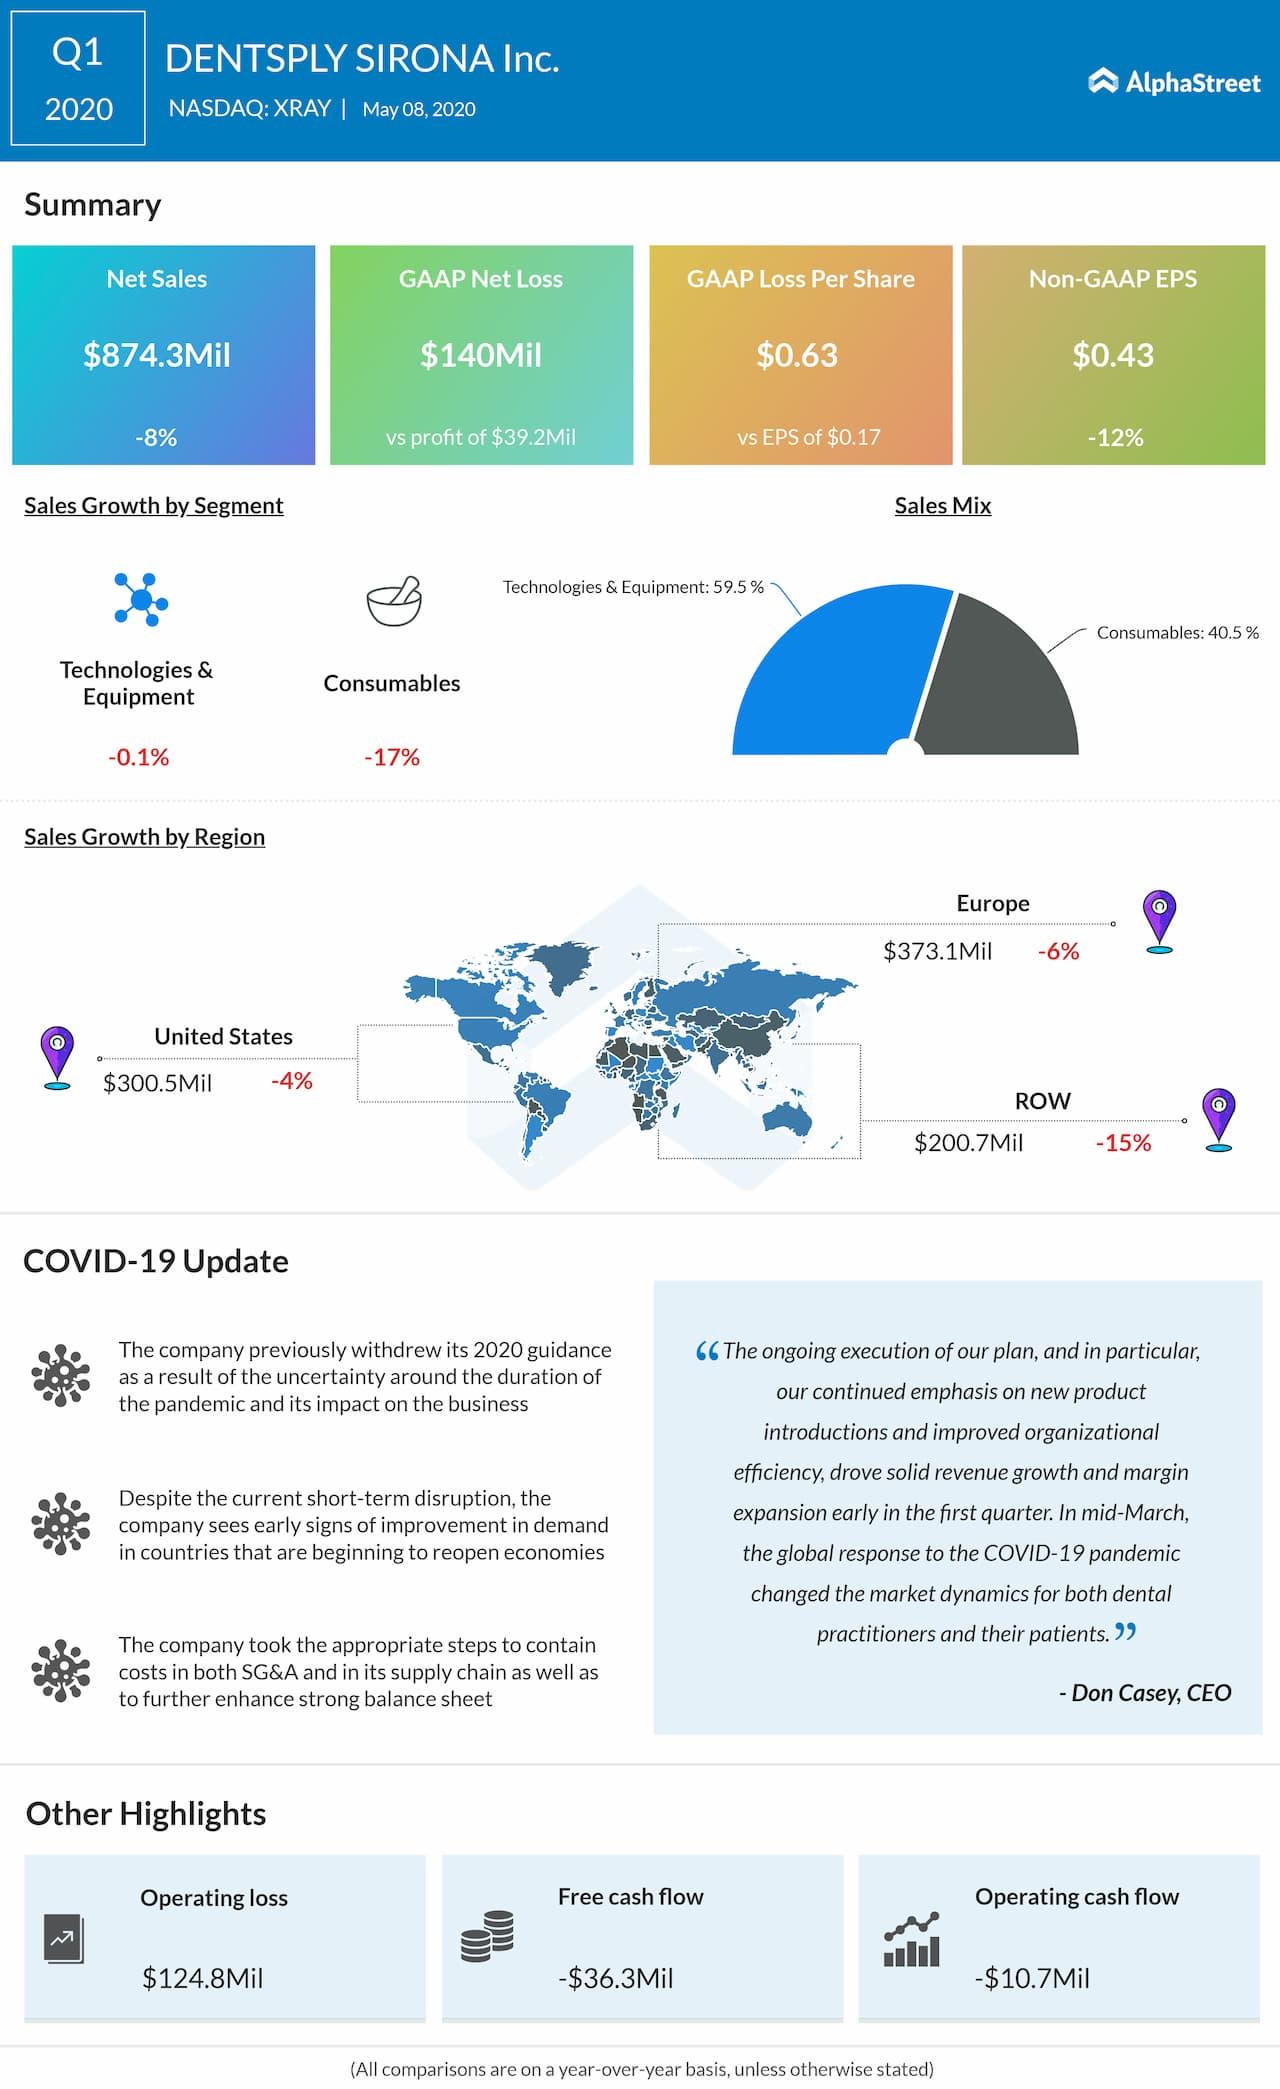 Dentsply Sirona (XRAY) Q1 2020 earnings review